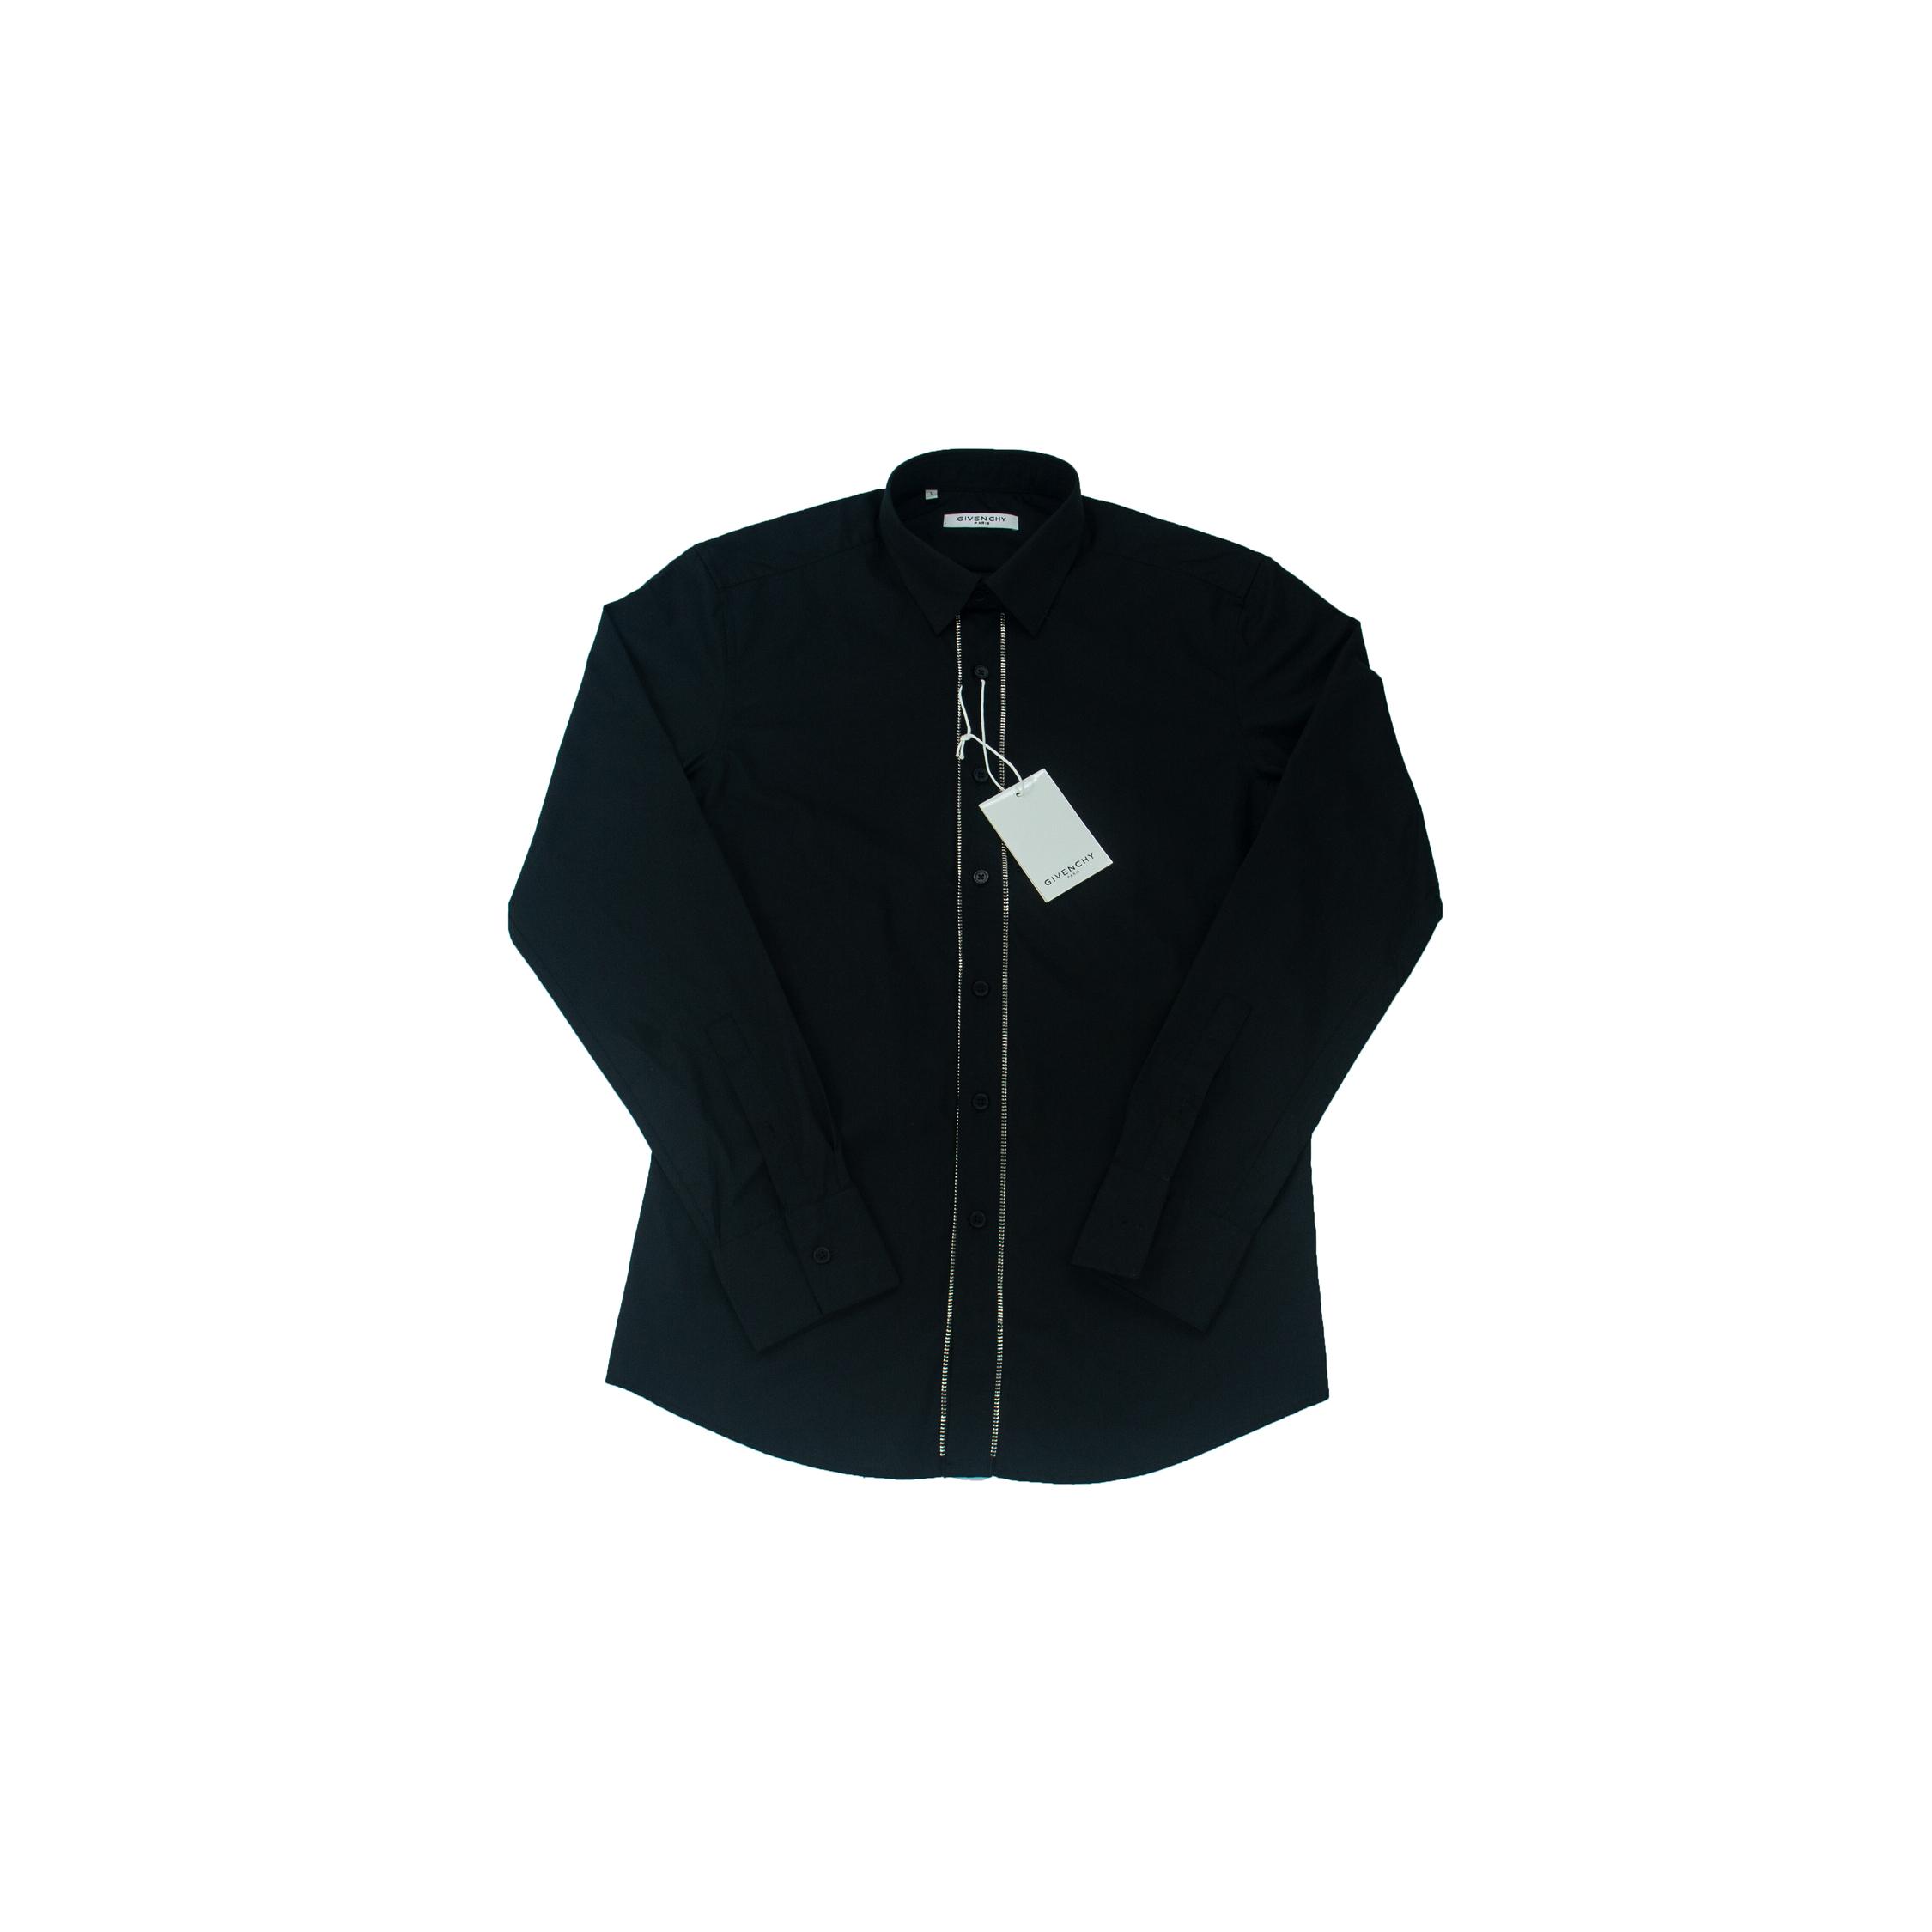 Áo sơ mi dài tay Givenchy Paris 2 khóa - đen